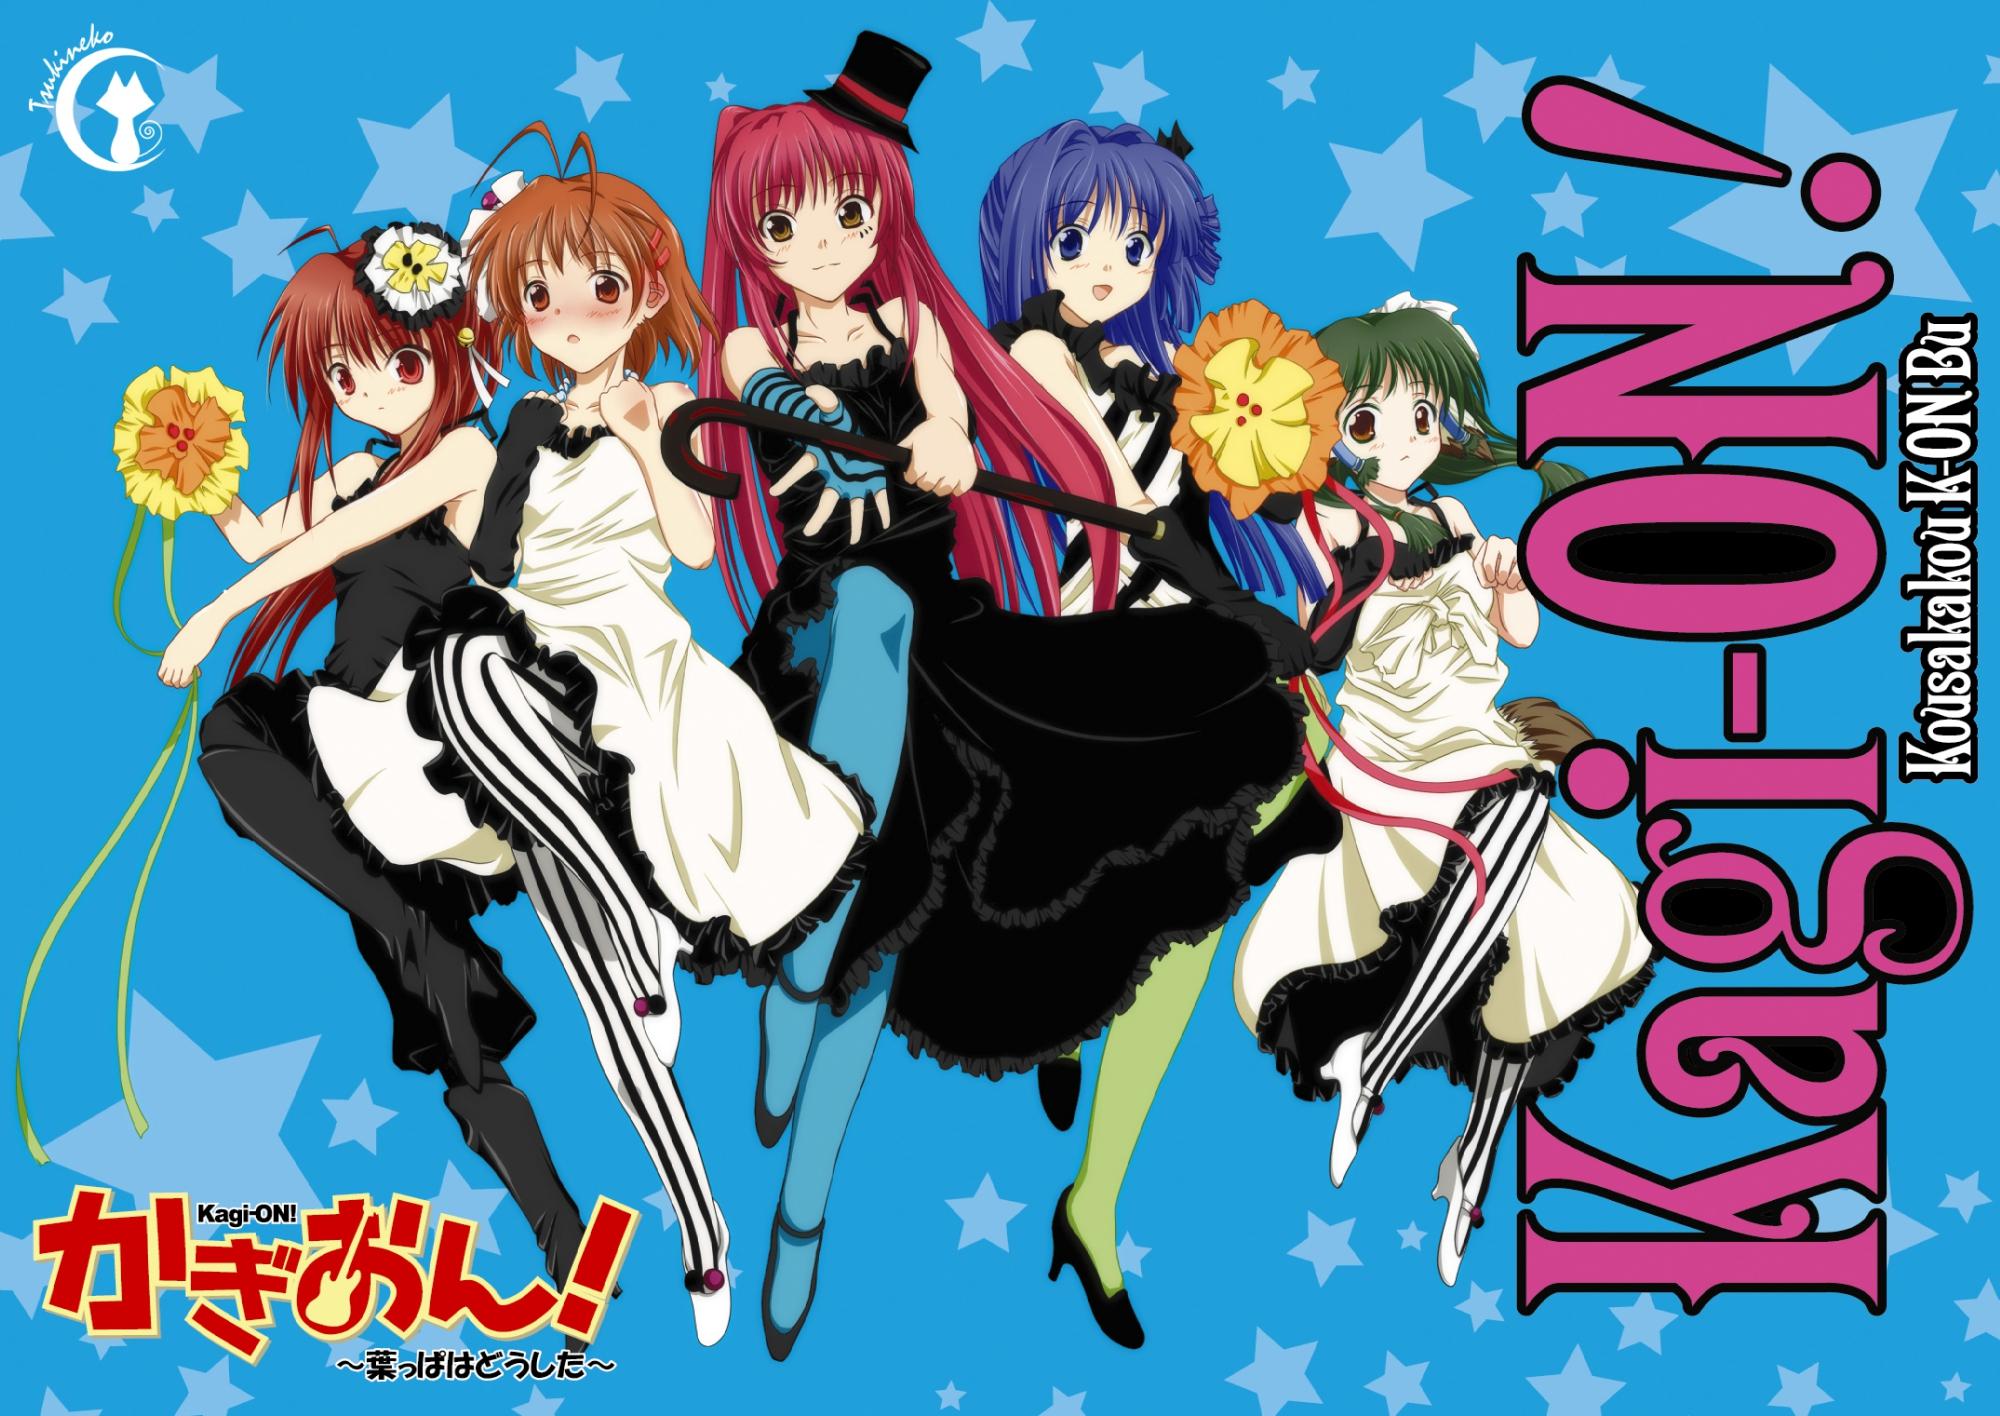 aruruw clannad crossover furukawa_nagisa kanon k-on! kousaka_tamaki little_busters! minase_nayuki natsume_rin parody to_heart to_heart_2 utawarerumono